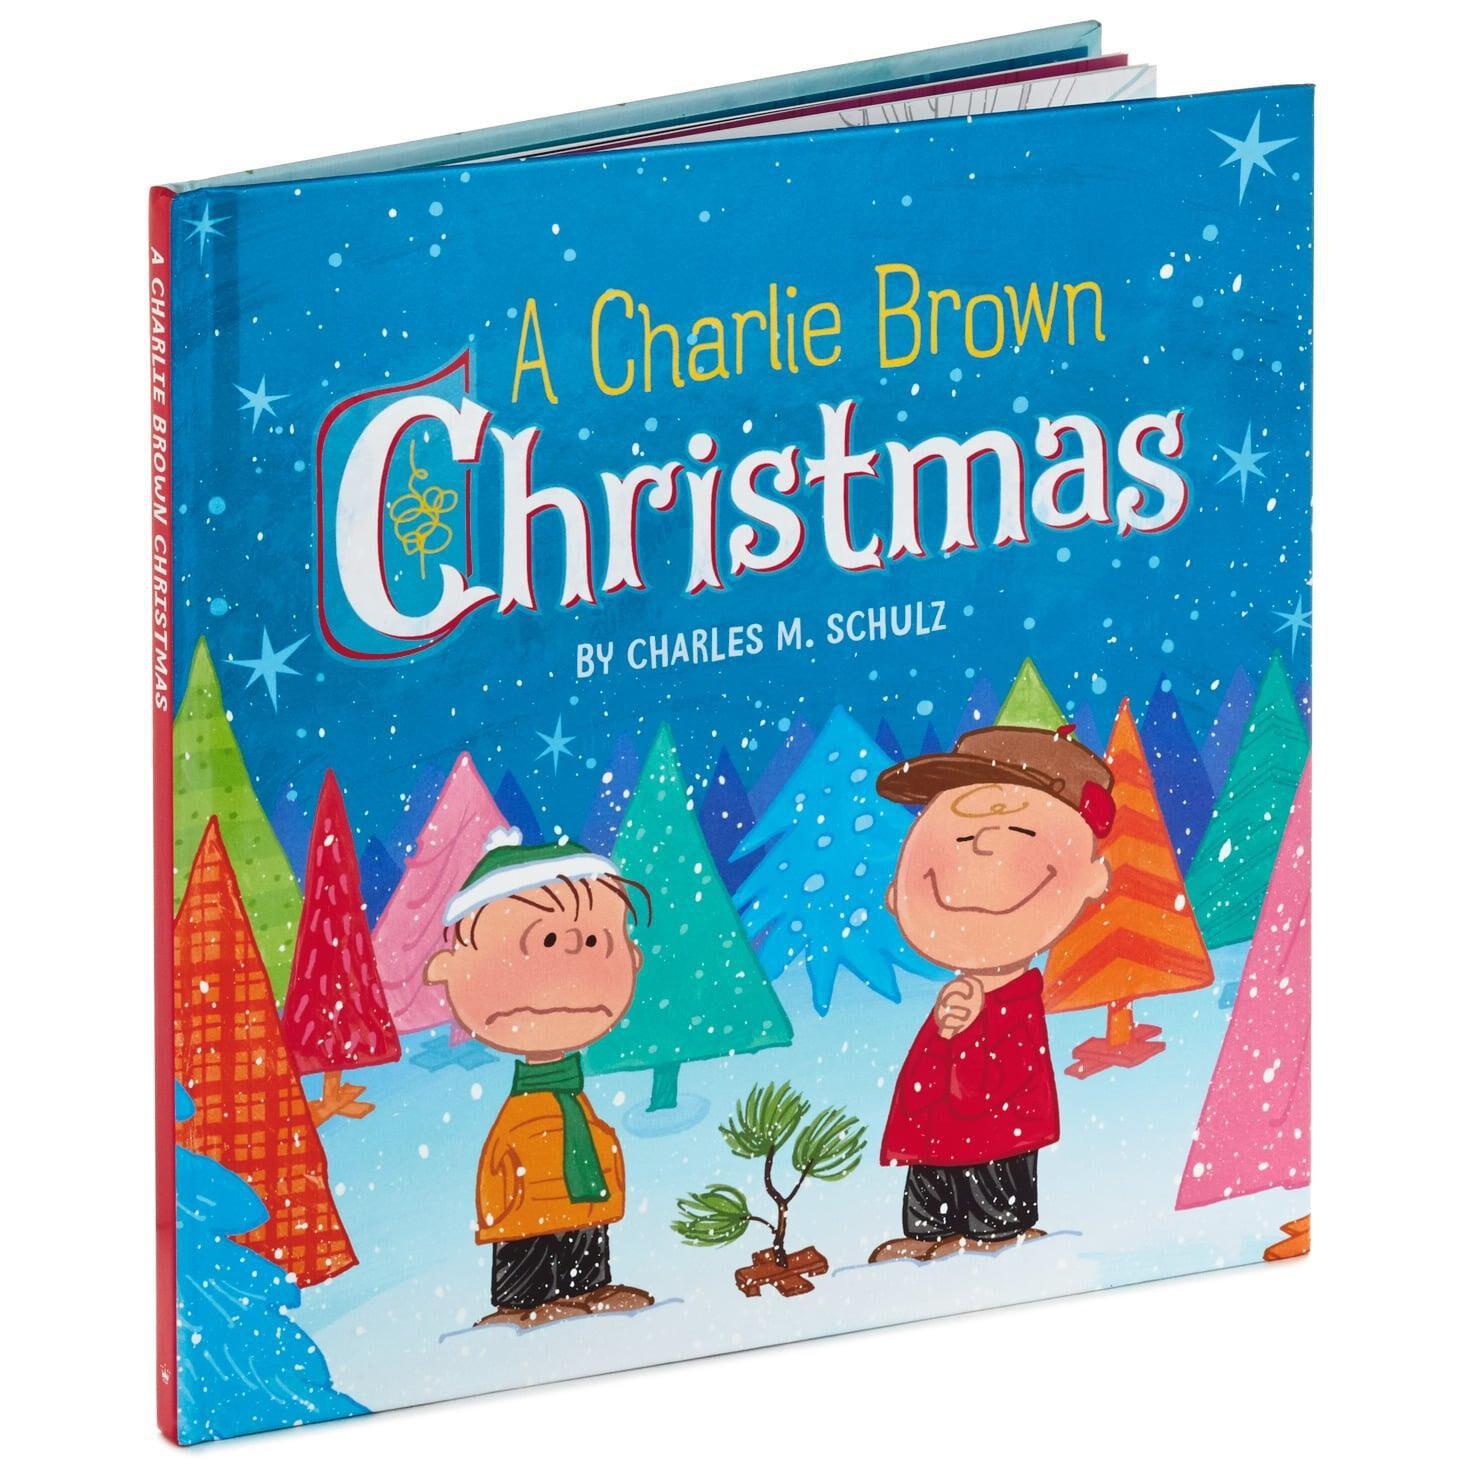 A Charlie Brown Christmas Book.Peanuts A Charlie Brown Christmas Pop Up Book